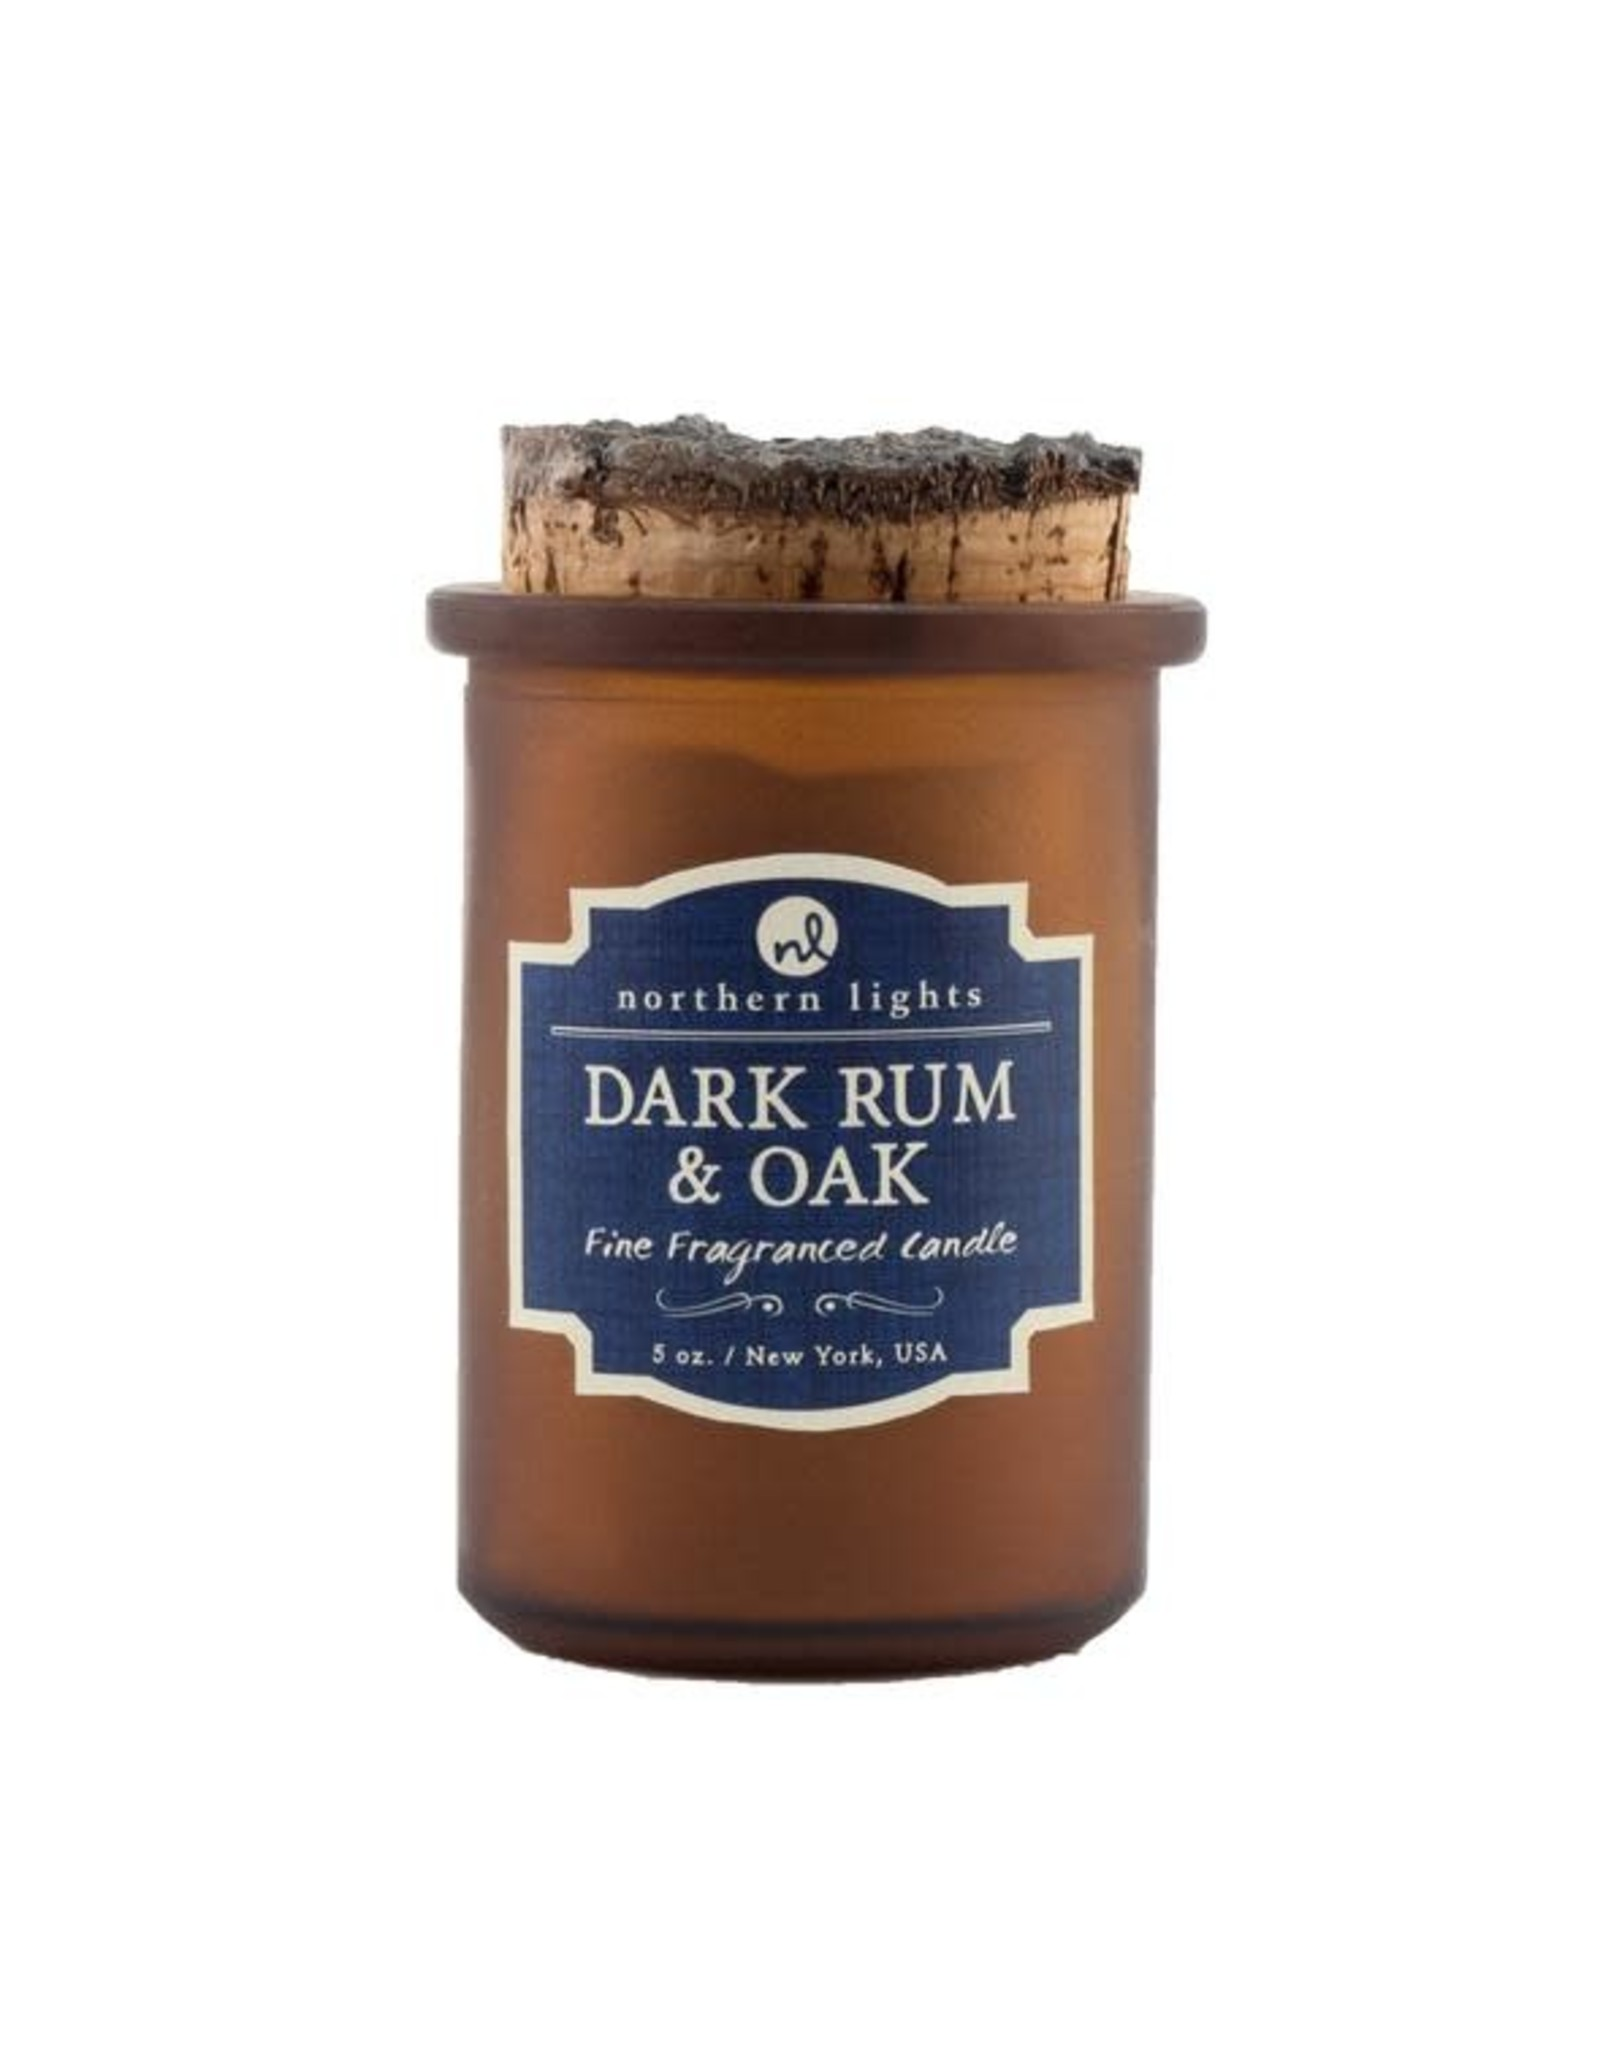 Northern Lights Candles Dark Rum & Oak 5oz Spirit Candle